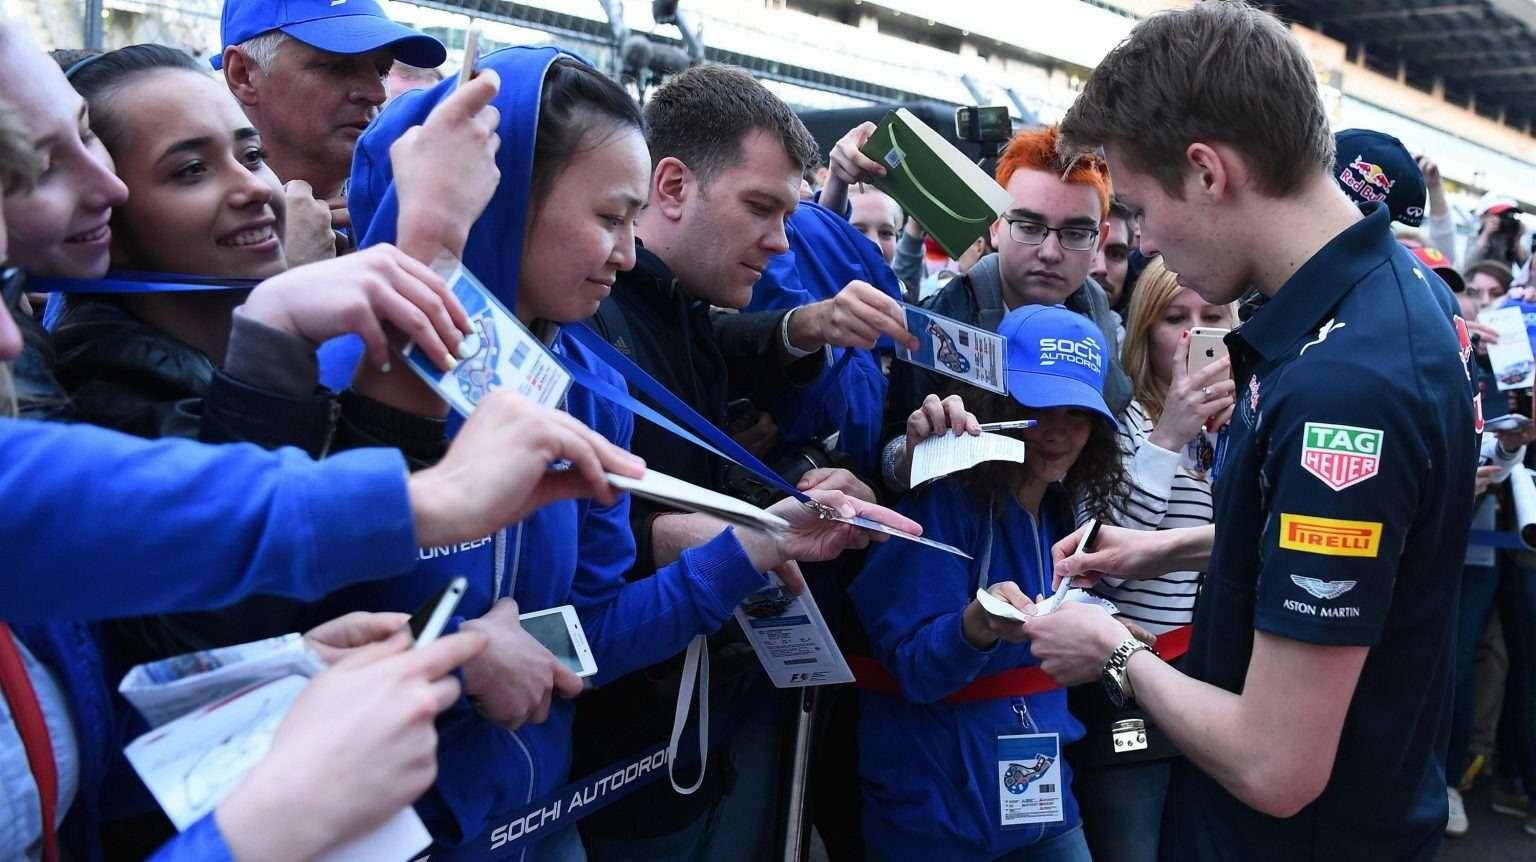 Даниил Квят, Toro Rosso, Red Bull Racing, Формула-1, Гран-при России, Сочи, Франц Тост